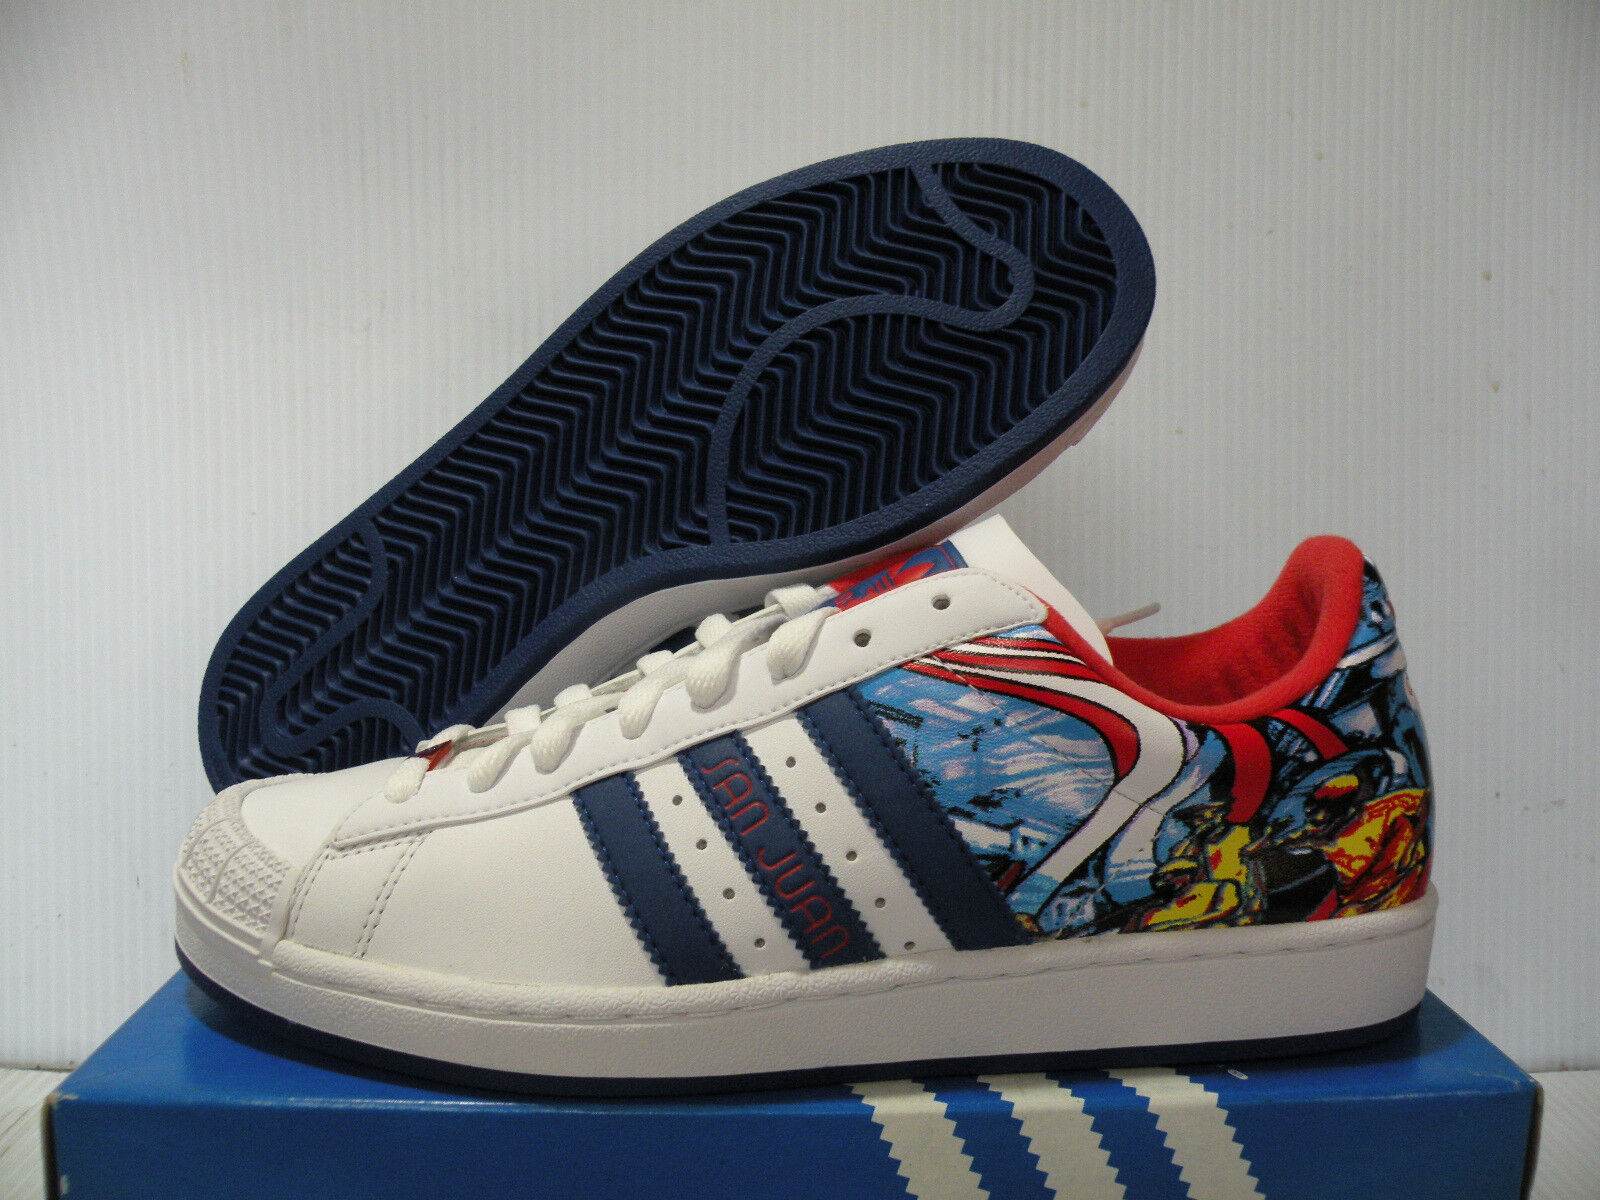 Adidas half-shells citt san juan scarpe 7 uomini scarpe bianche 562386 7 scarpe nuove dimensioni 785d4d